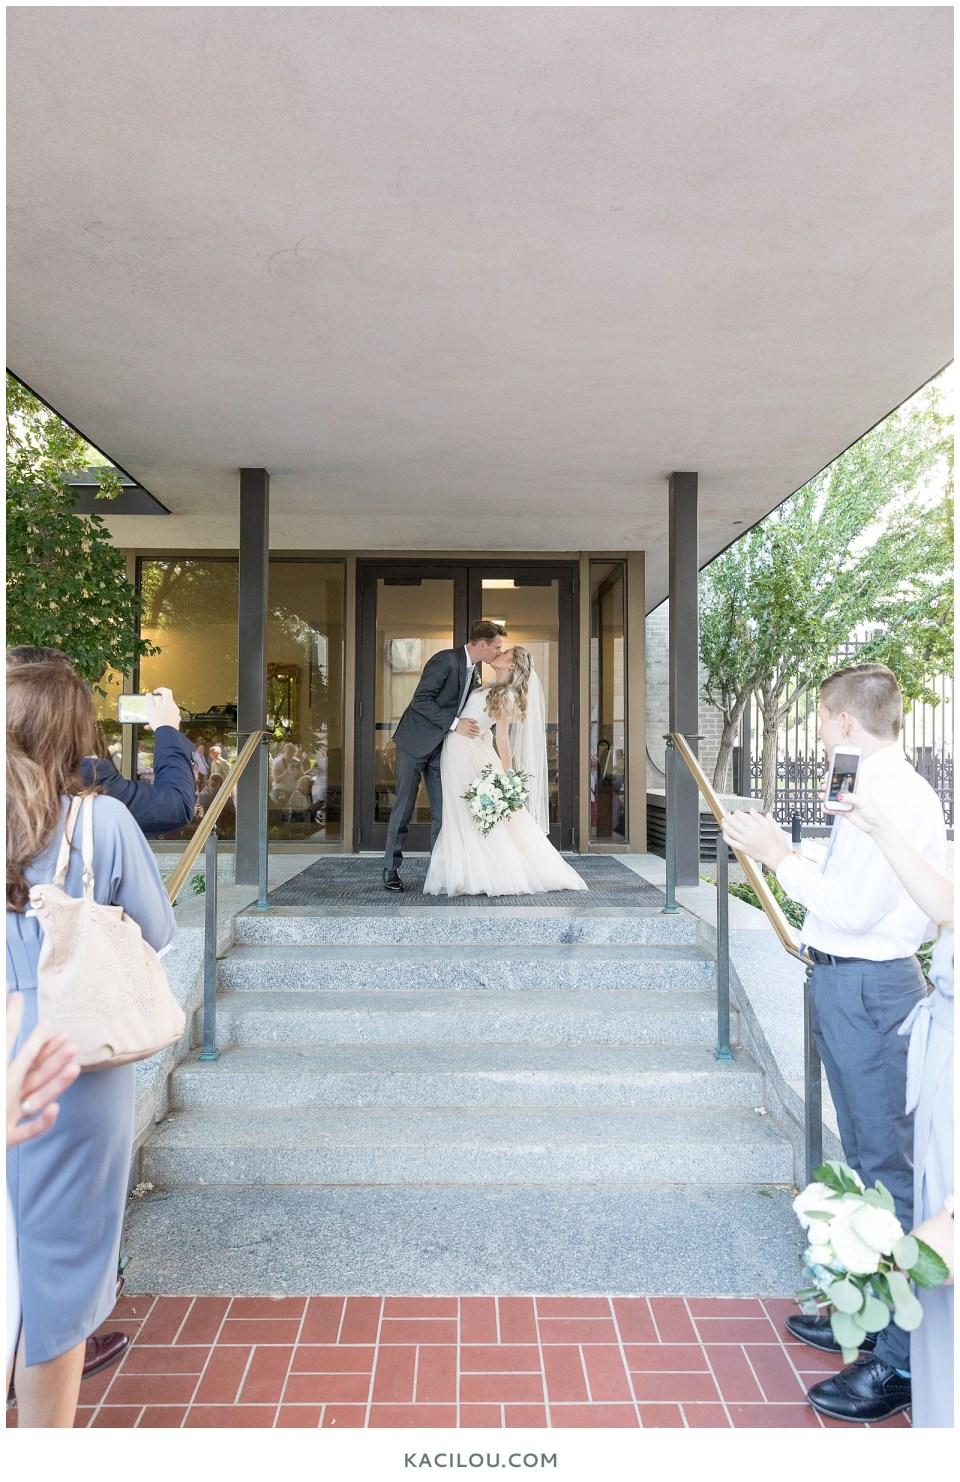 Salt Lake City Temple Wedding Photos by Kaci Lou Photography for Sam and Kennedy-7009.jpg